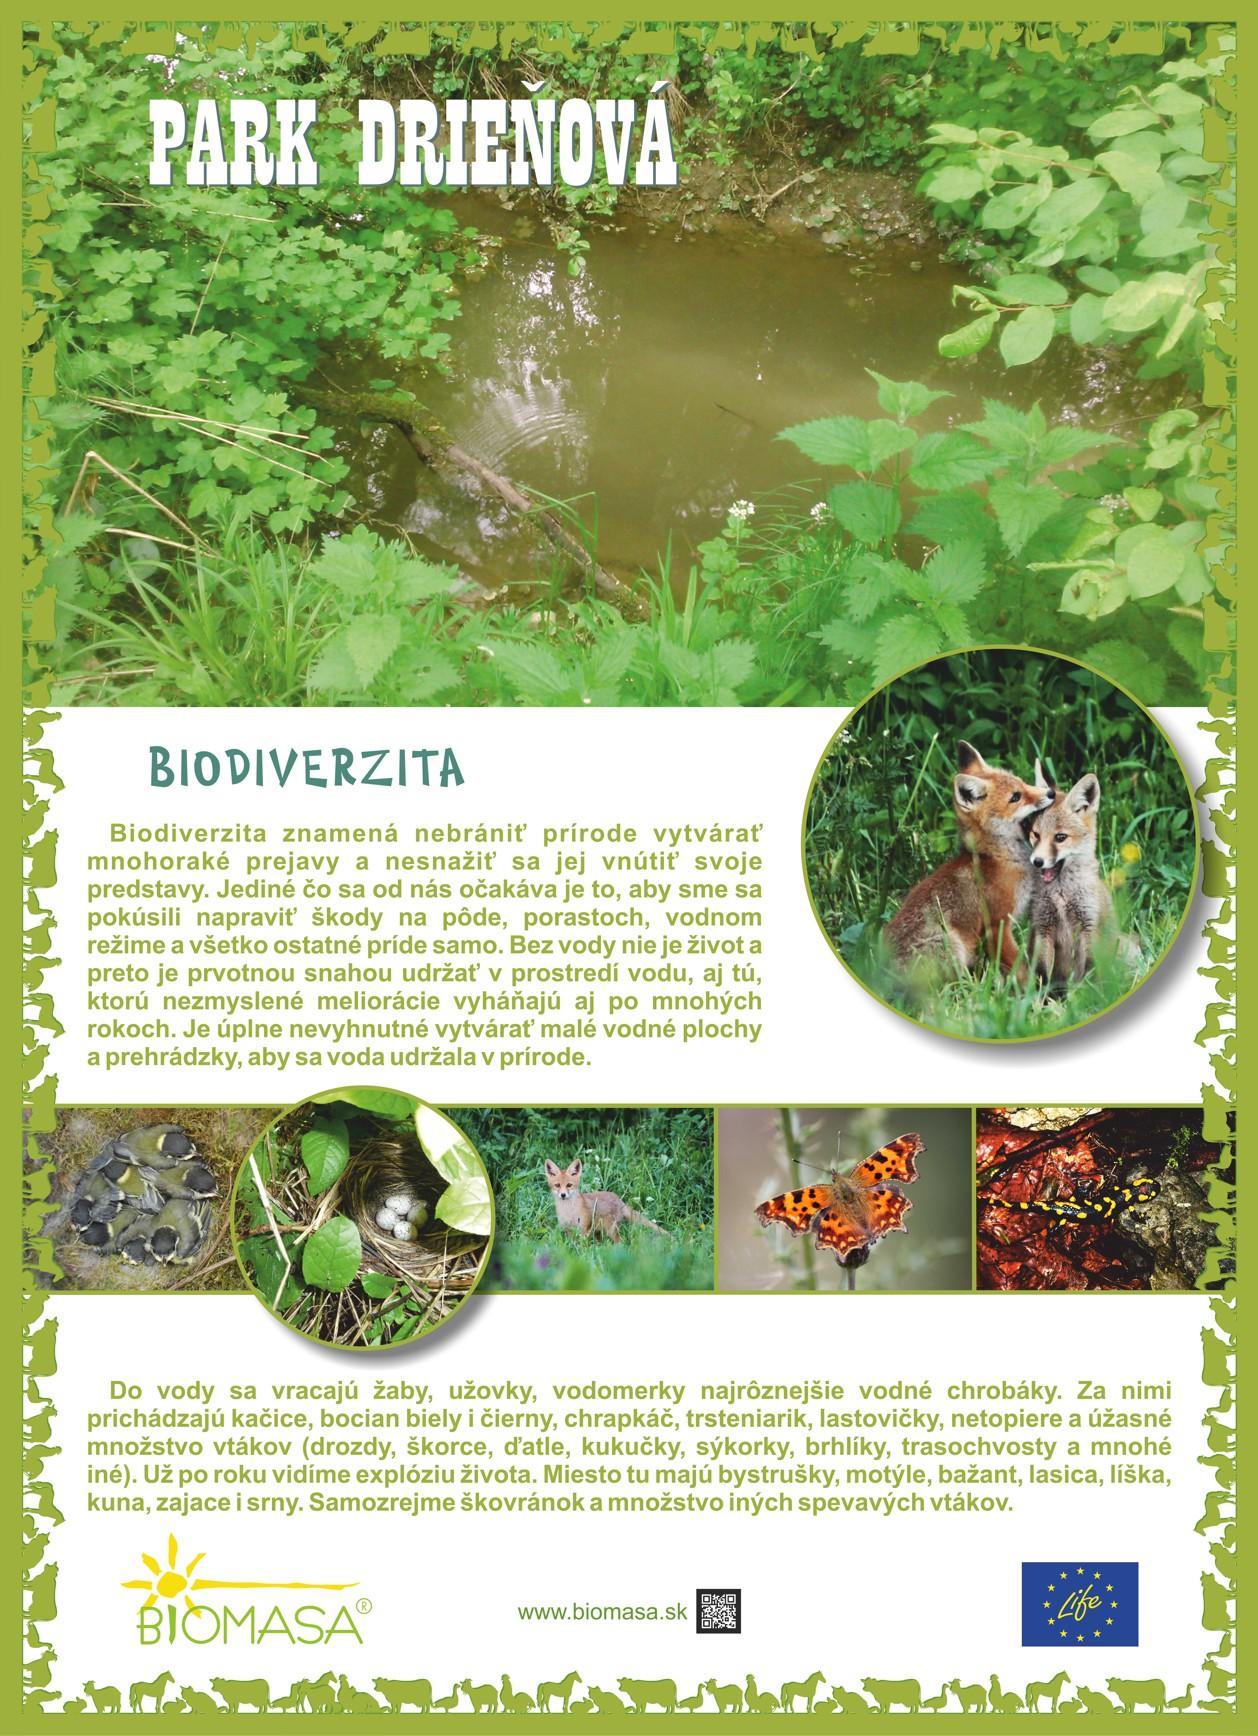 medium-promo-biomasa-park-drienova_panel-2